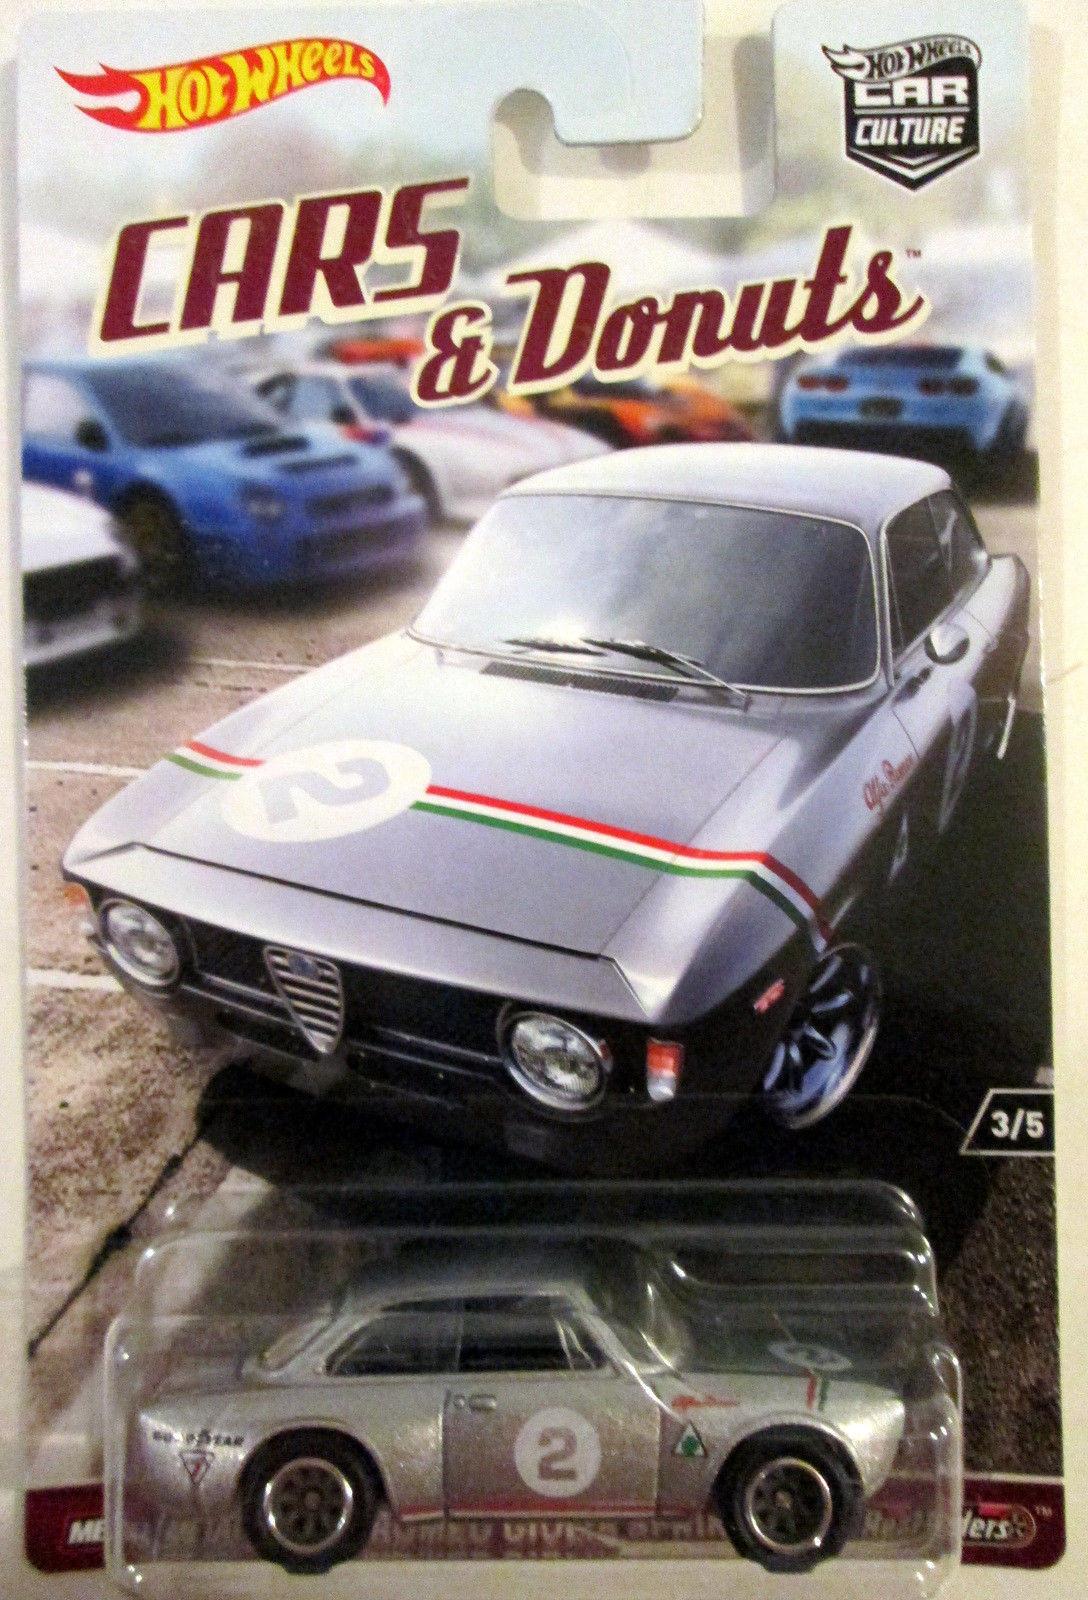 Hot Wheels - Alfa Romeo Giulia Sprint GTA Prata - Cars & Donuts - Car Culture